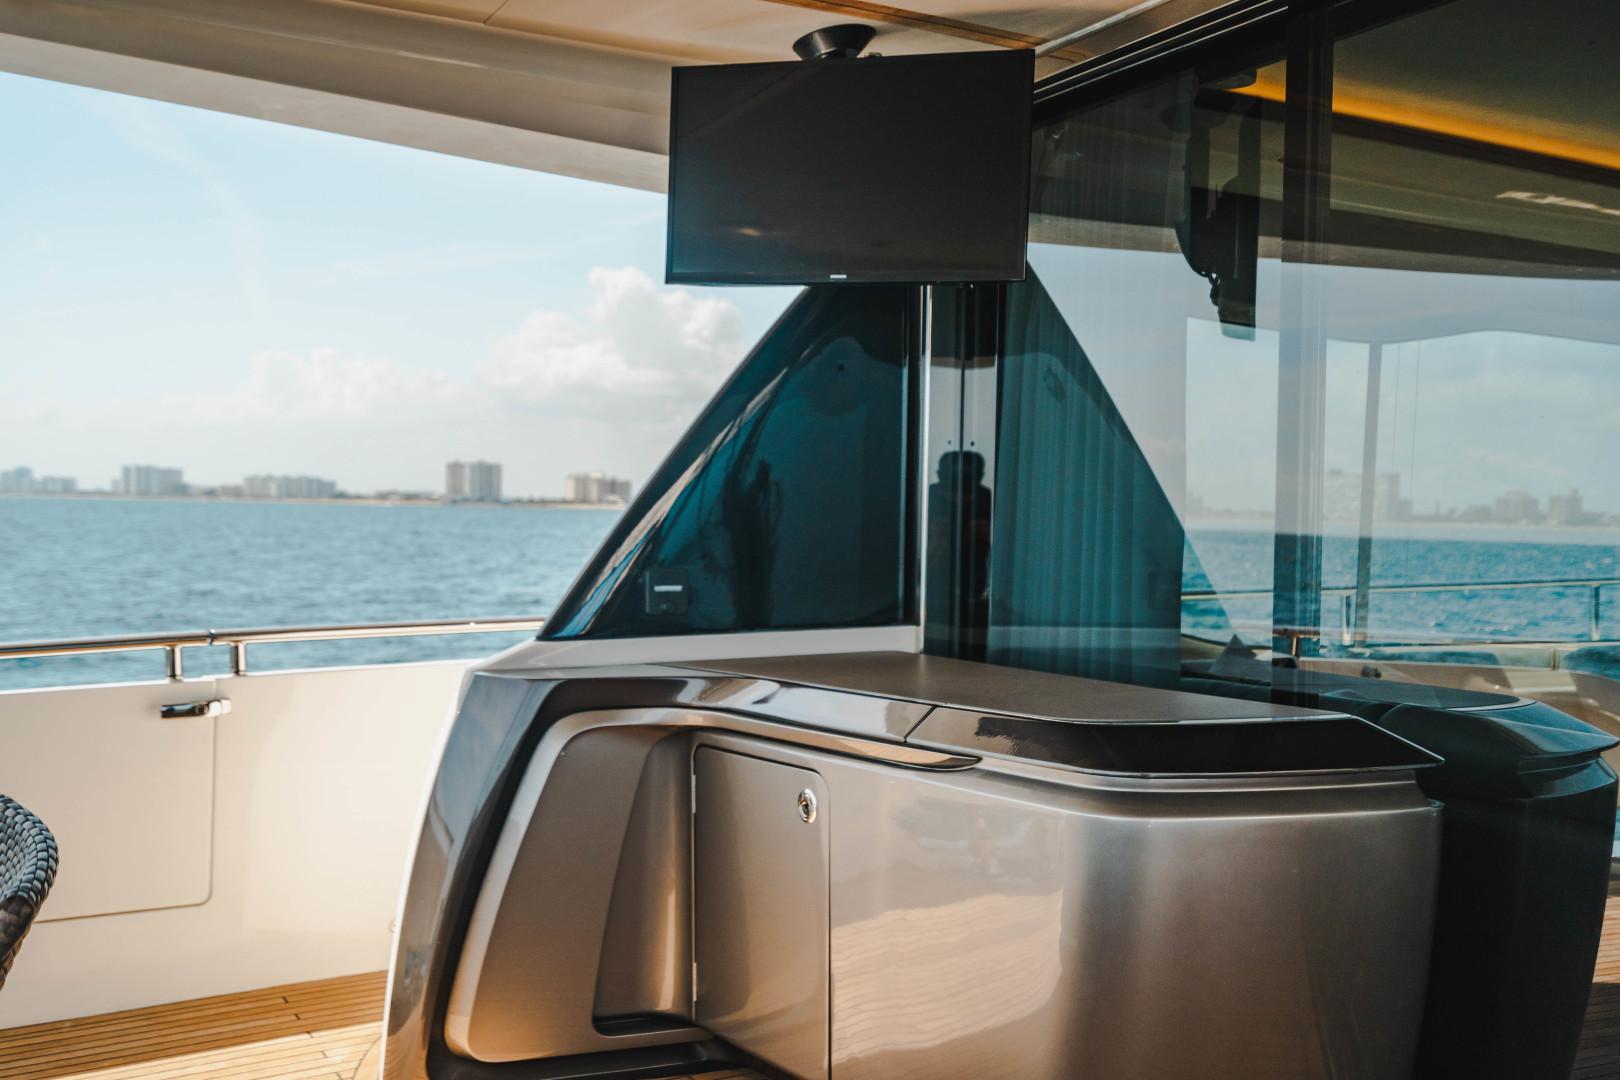 Princess-Y85  2019-Splash Delray Beach-Florida-United States-1631612 | Thumbnail